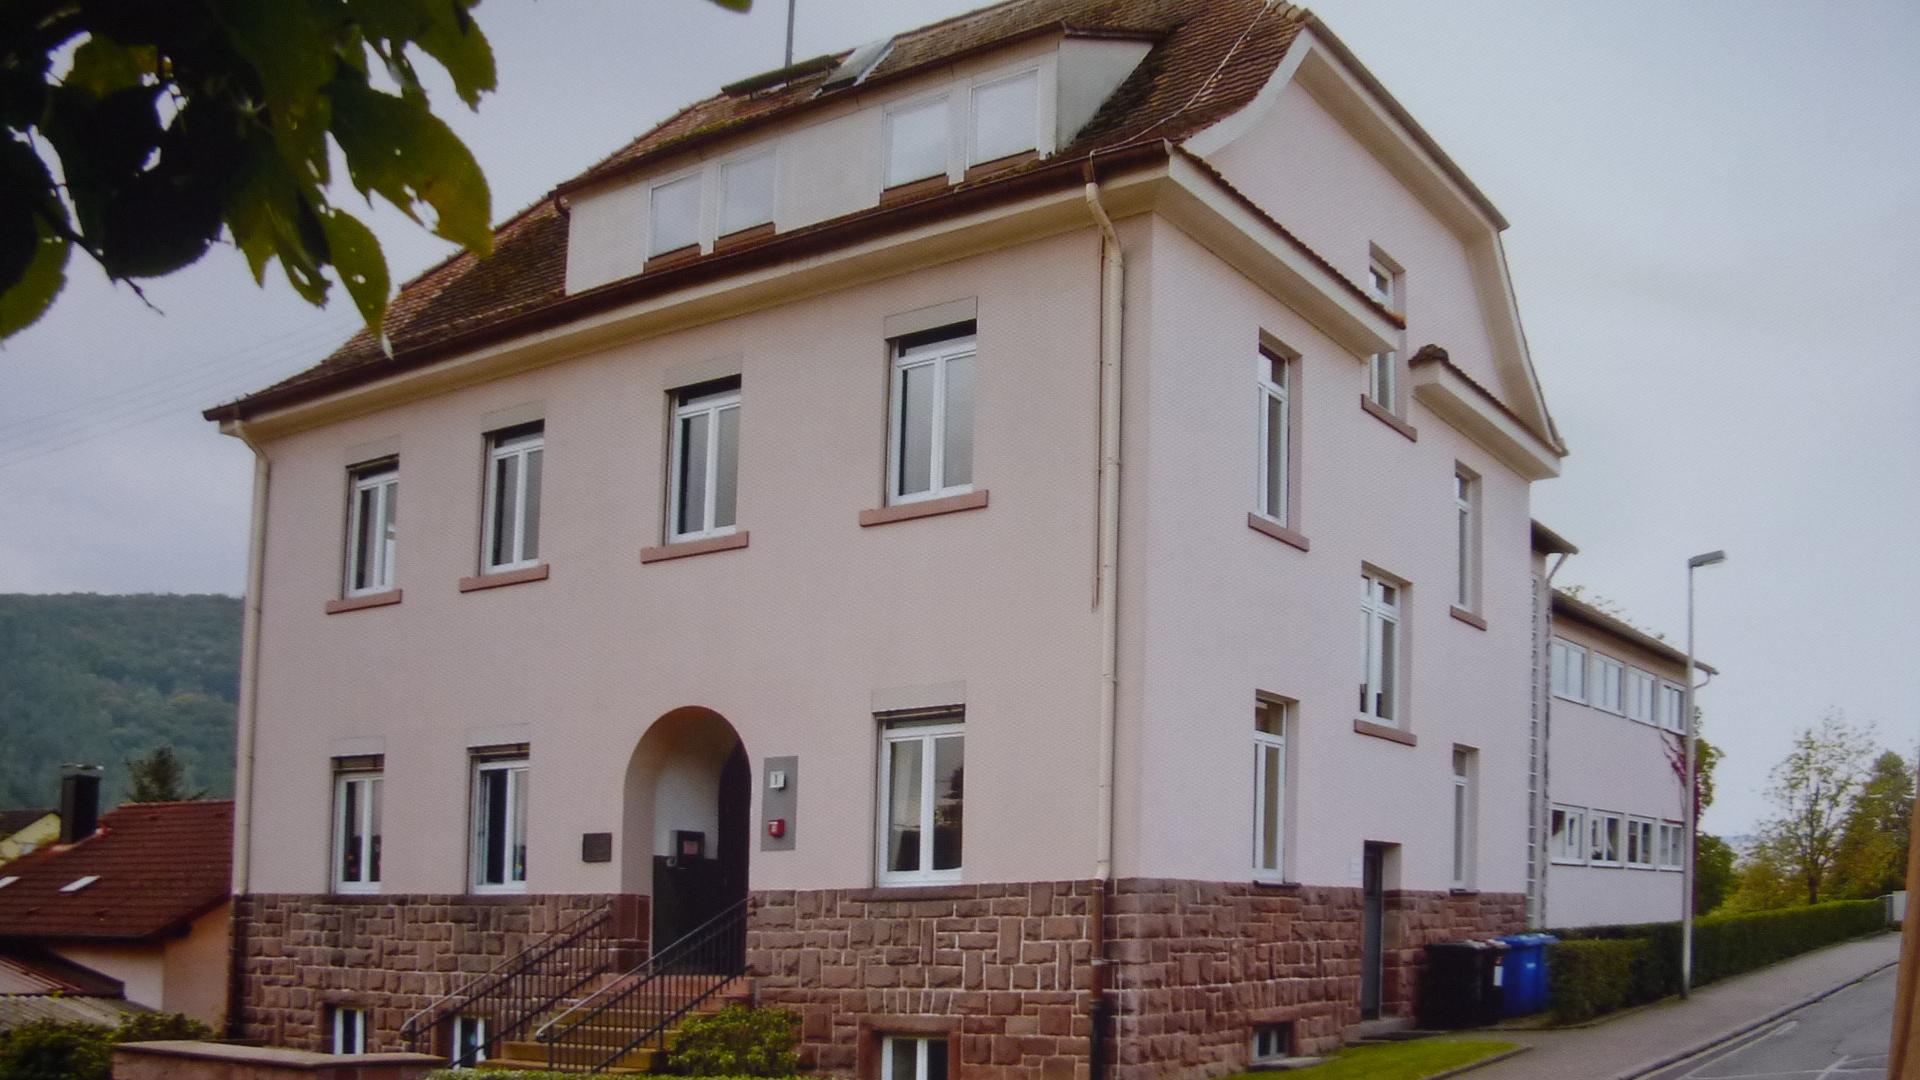 Grundschule Sackenbach